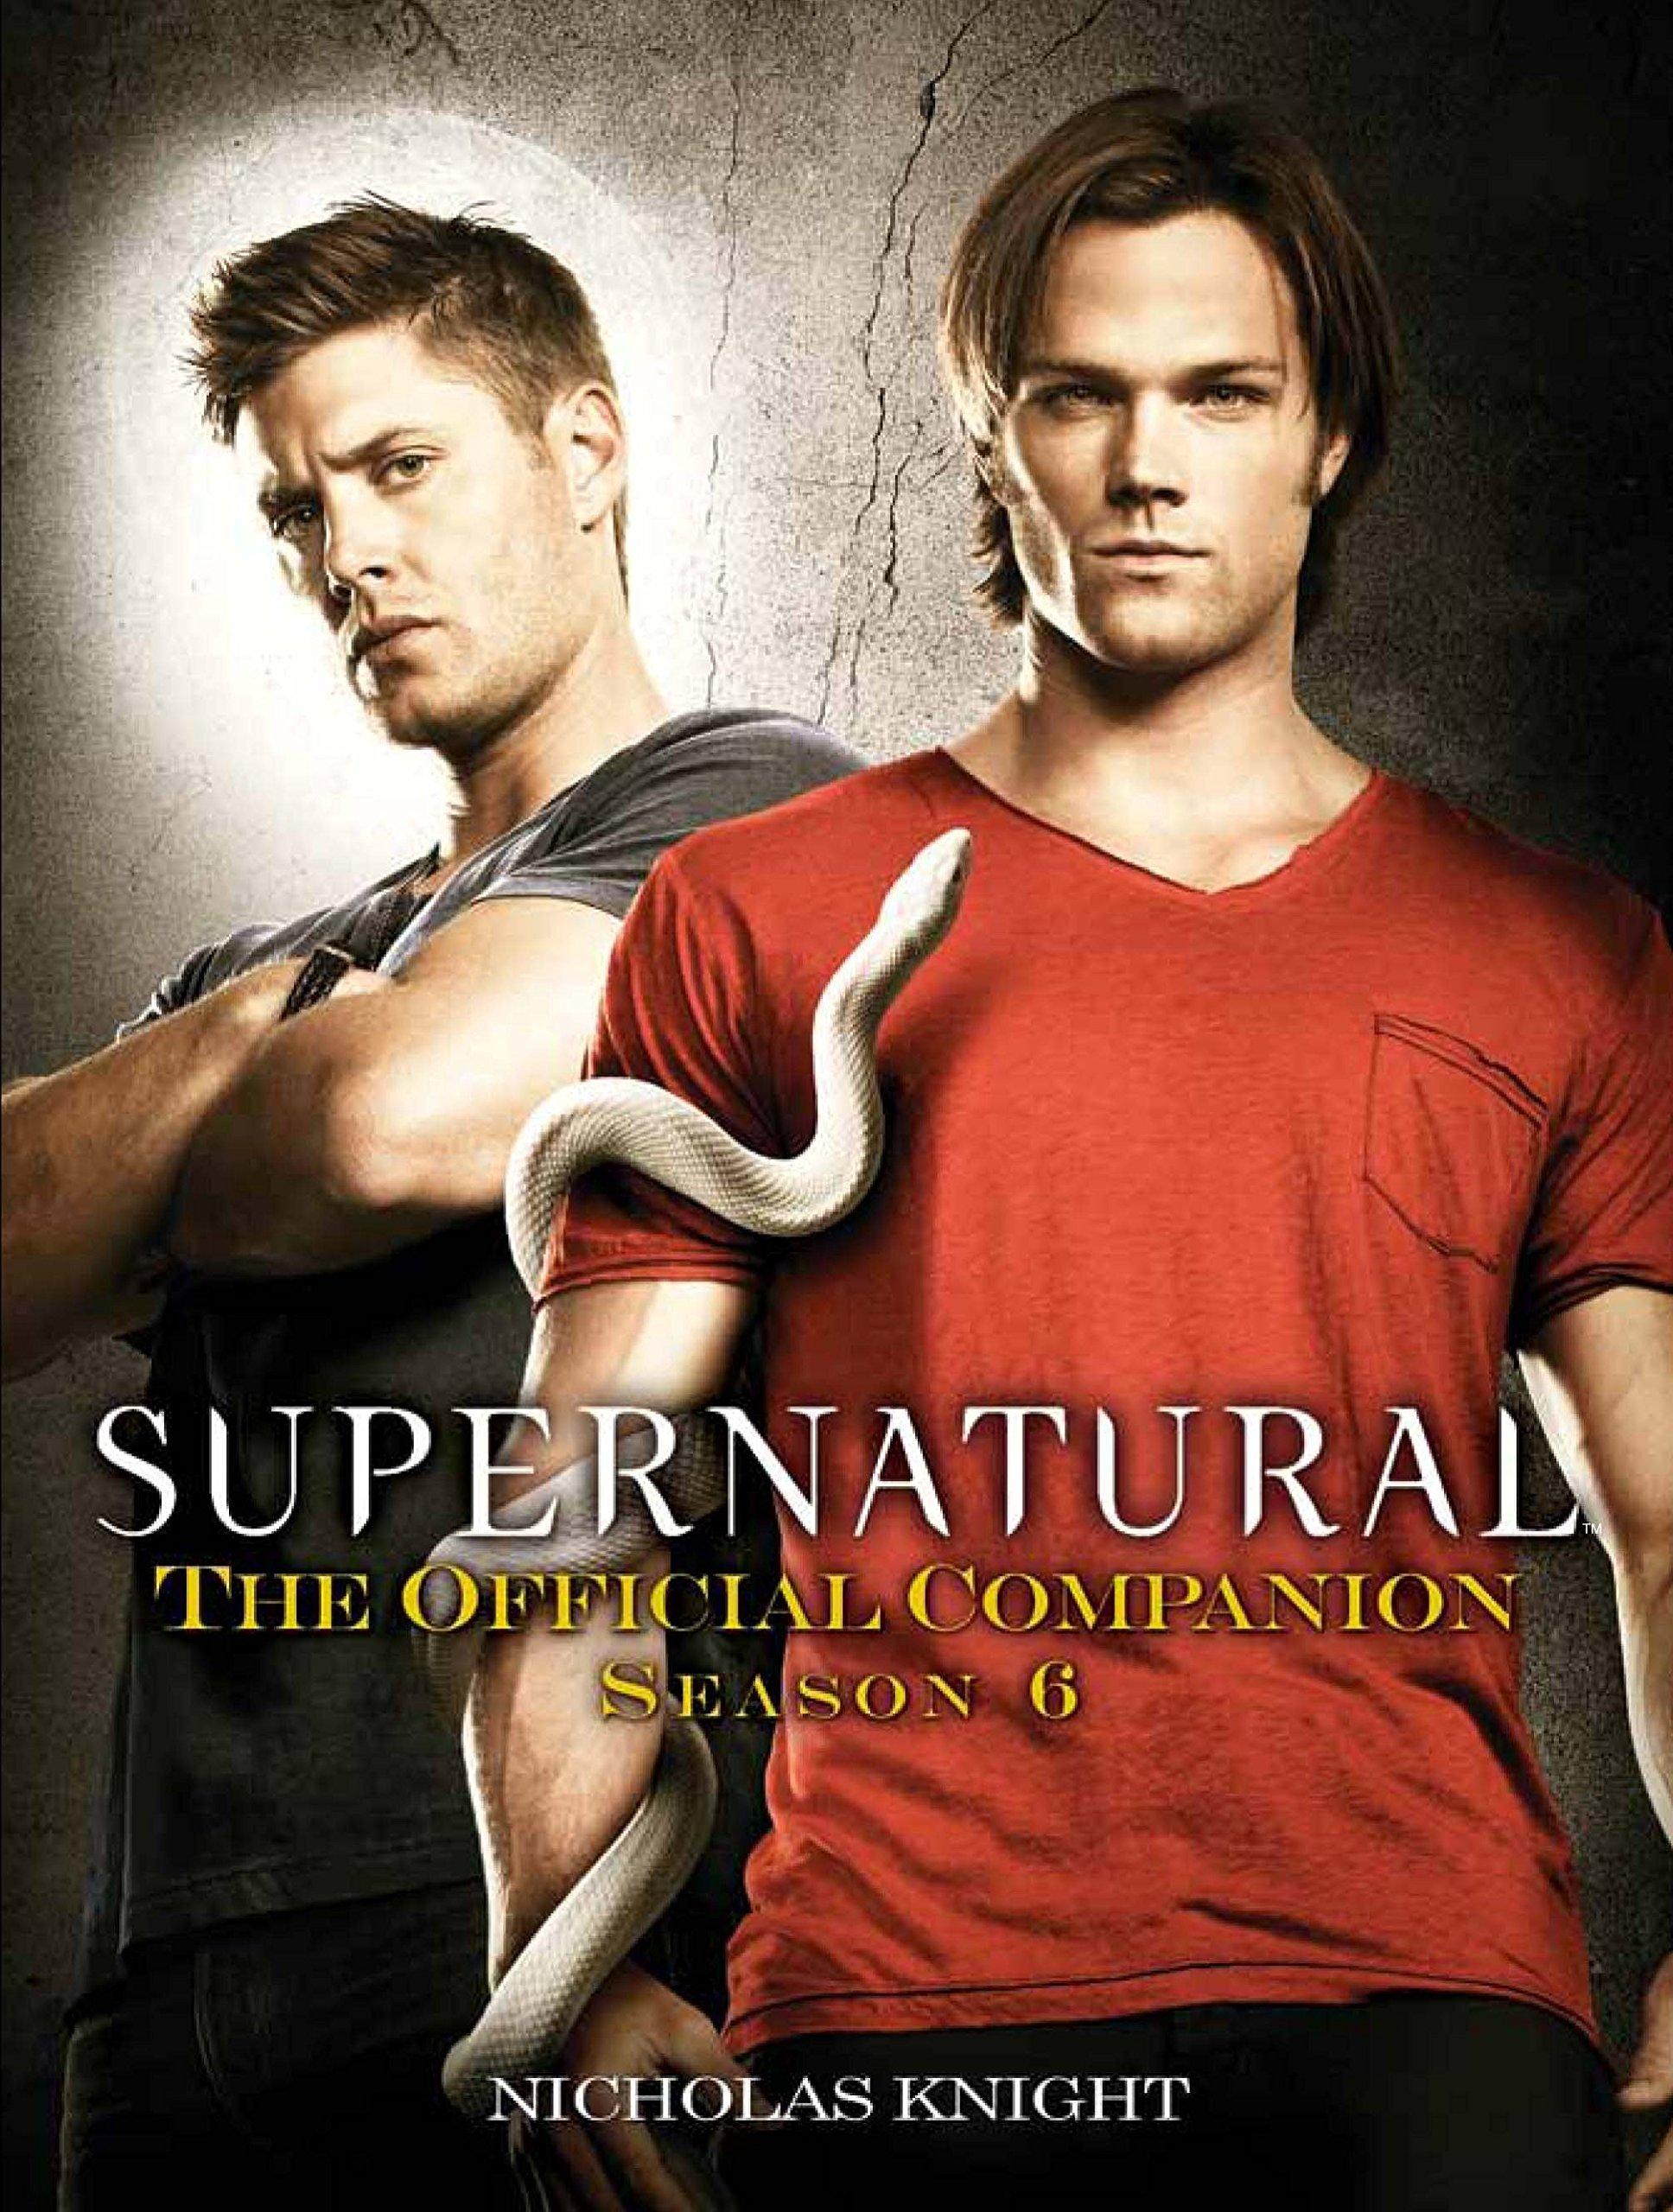 Supernatural: The Official Companion Season 6: Nicholas